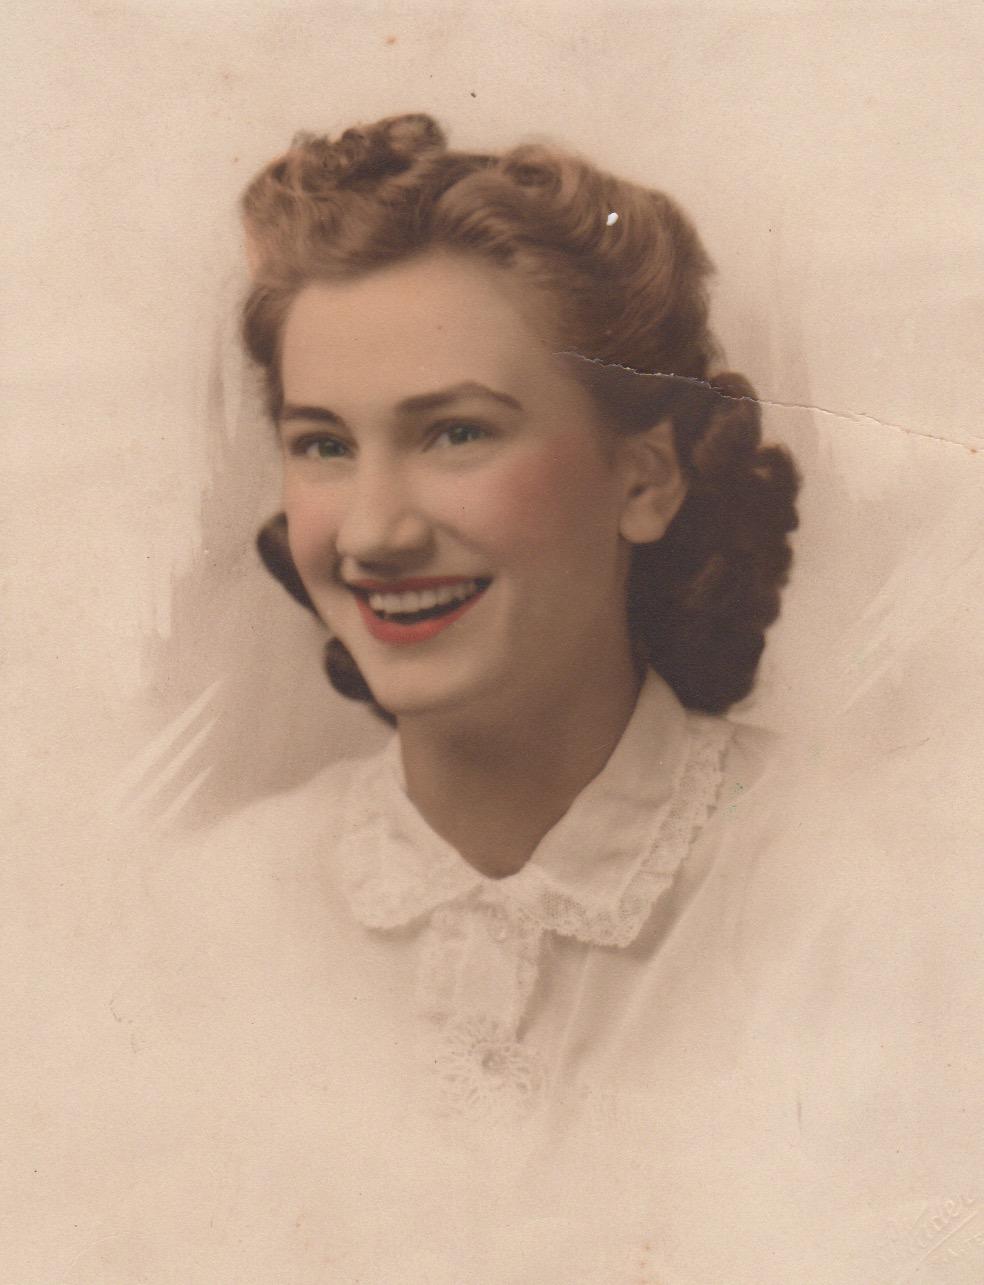 Anastasia Viola Marie Michalec Kresta | Born March 4, 1922 |La Grange, Texas